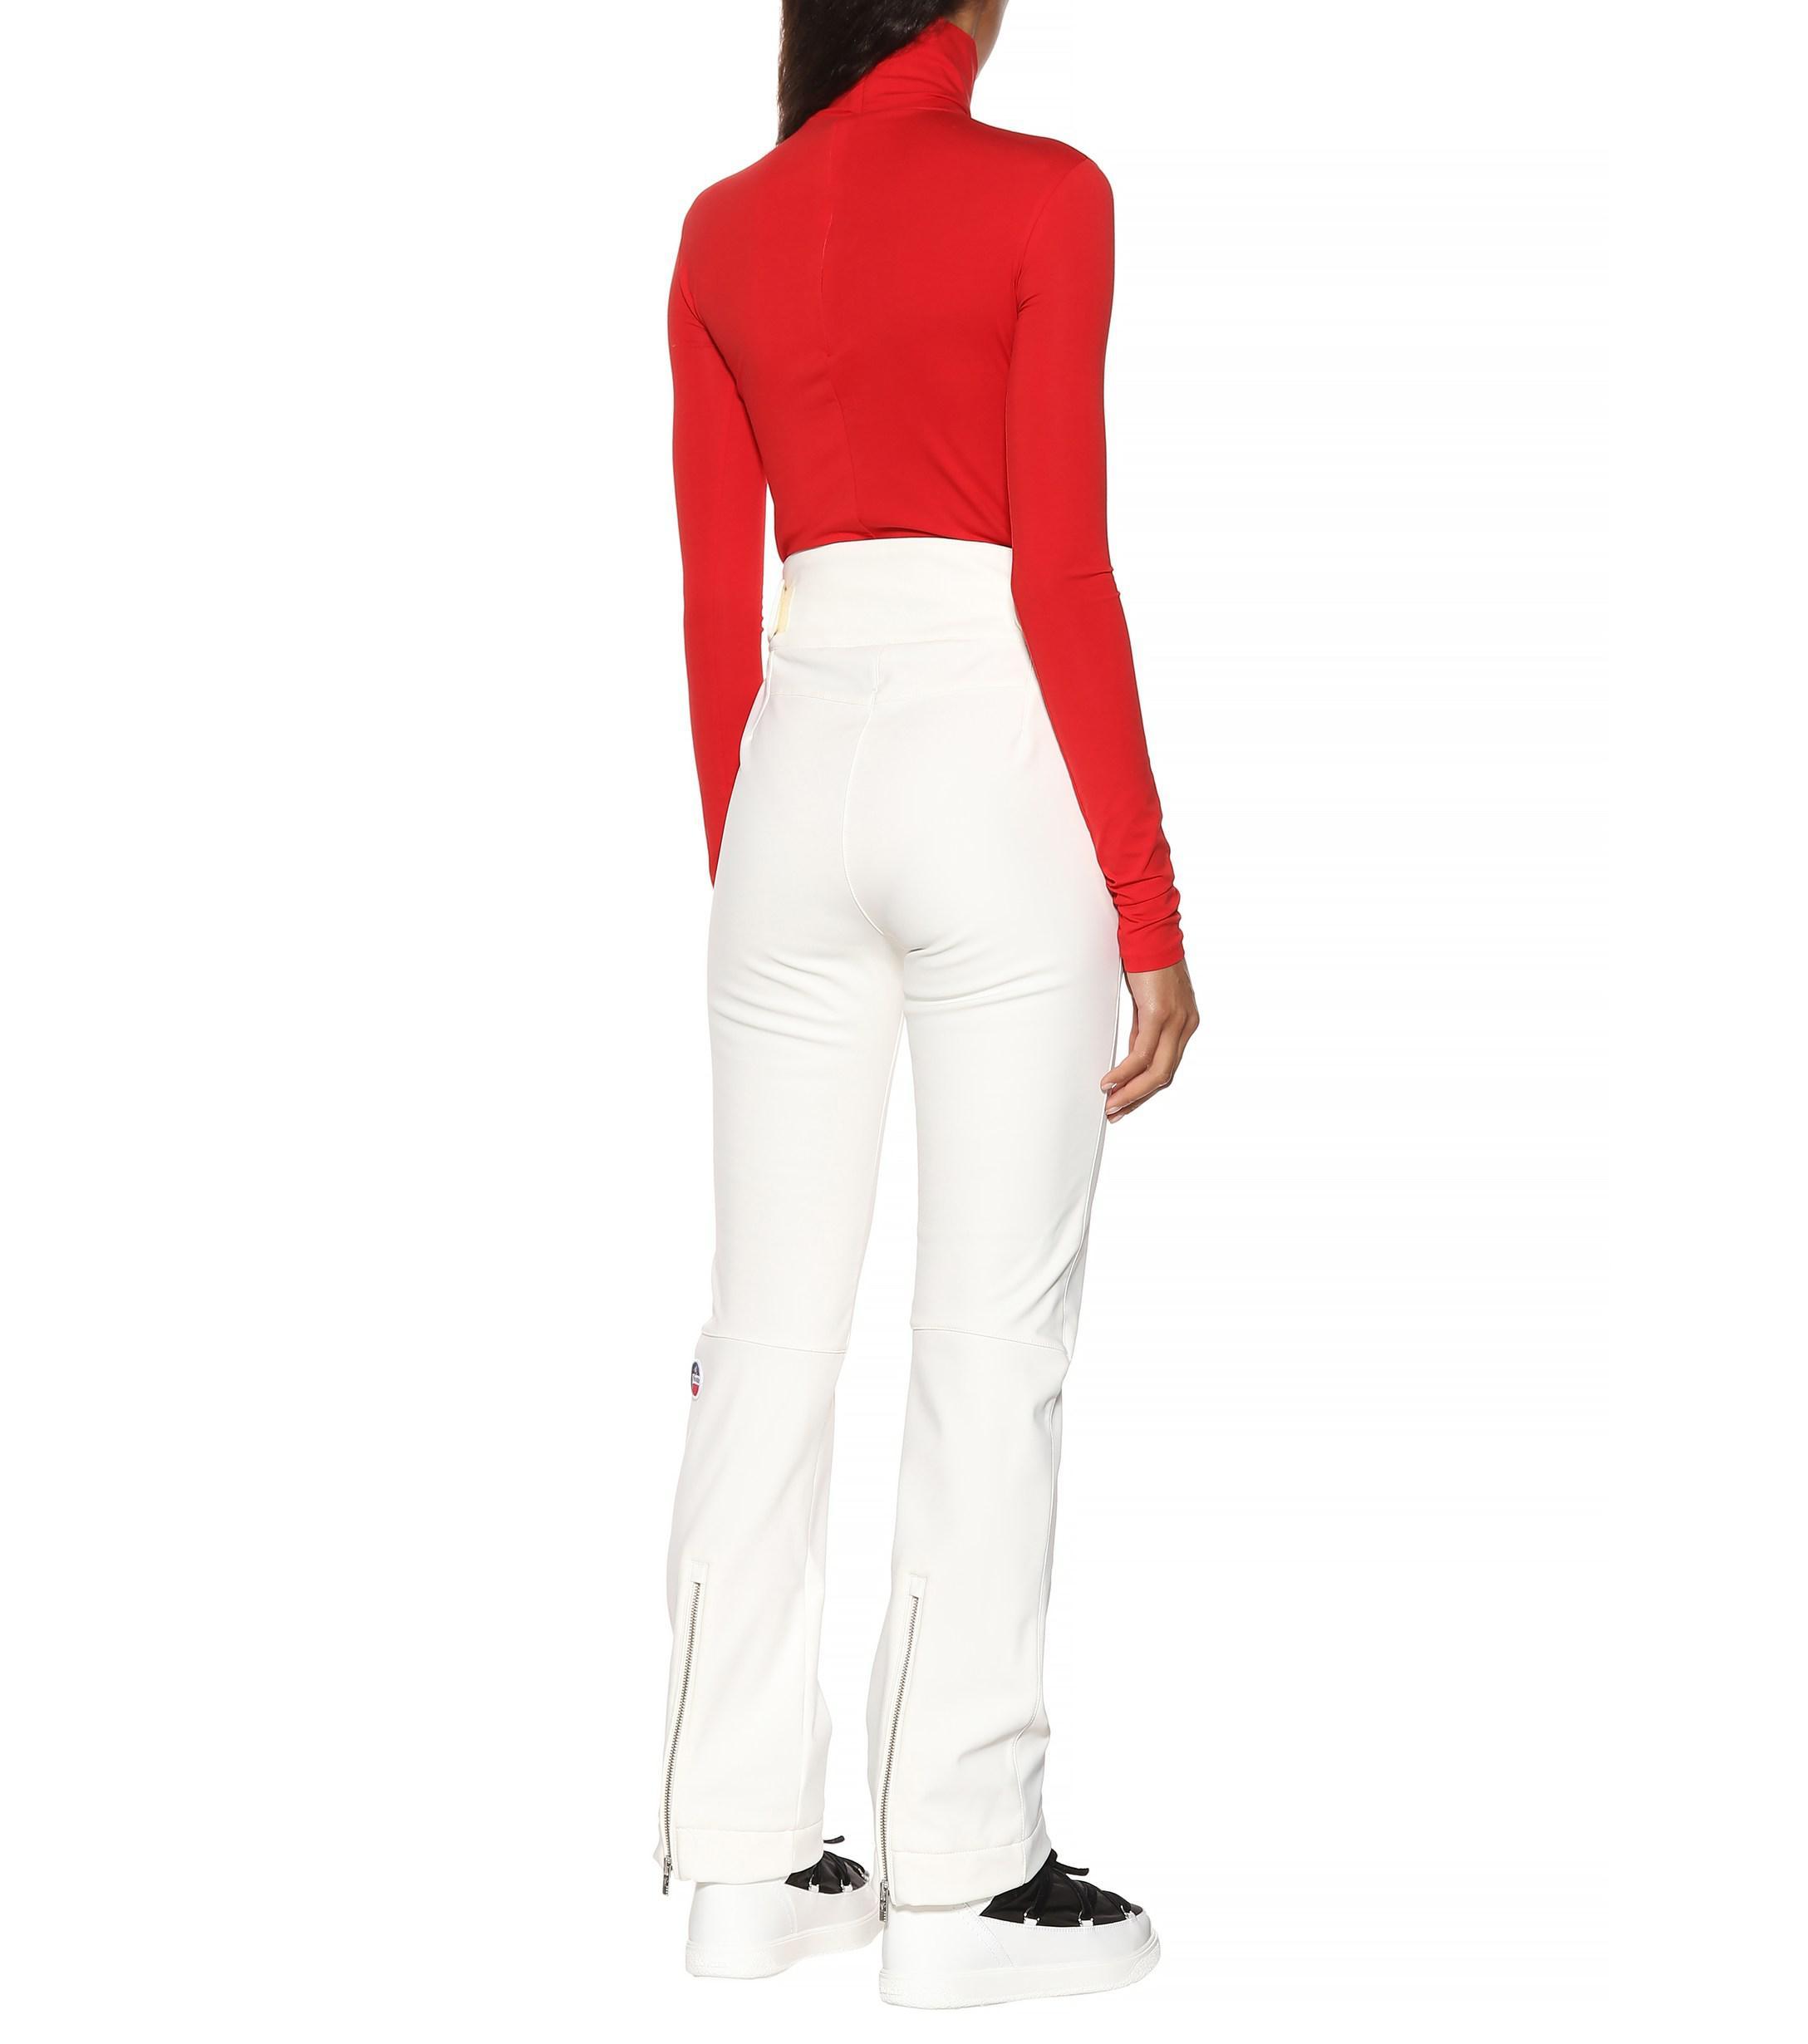 414096e1504 fusalp-white-Vega-Flared-Ski-Pants.jpeg